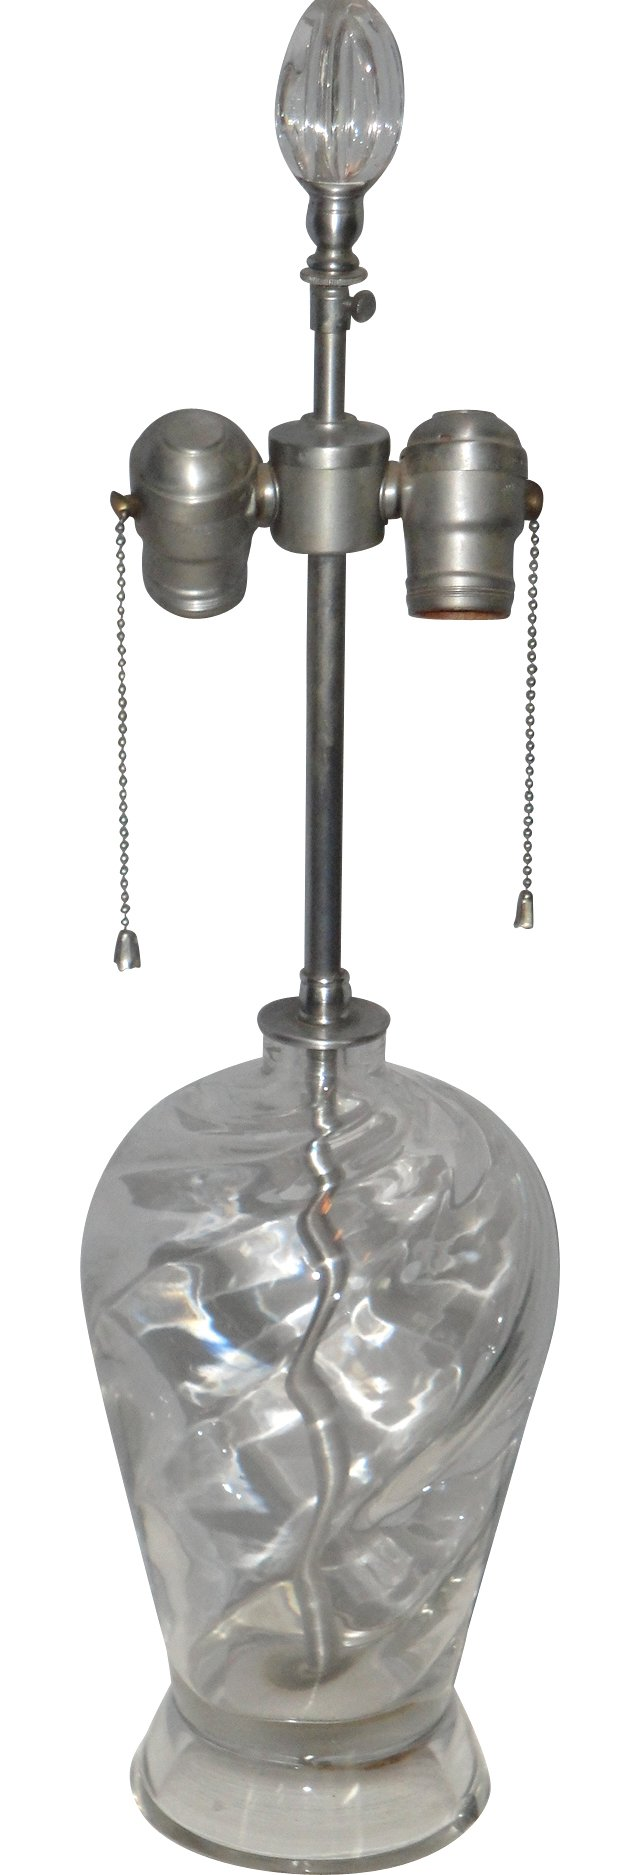 Brushed Nickel & Glass Lamp